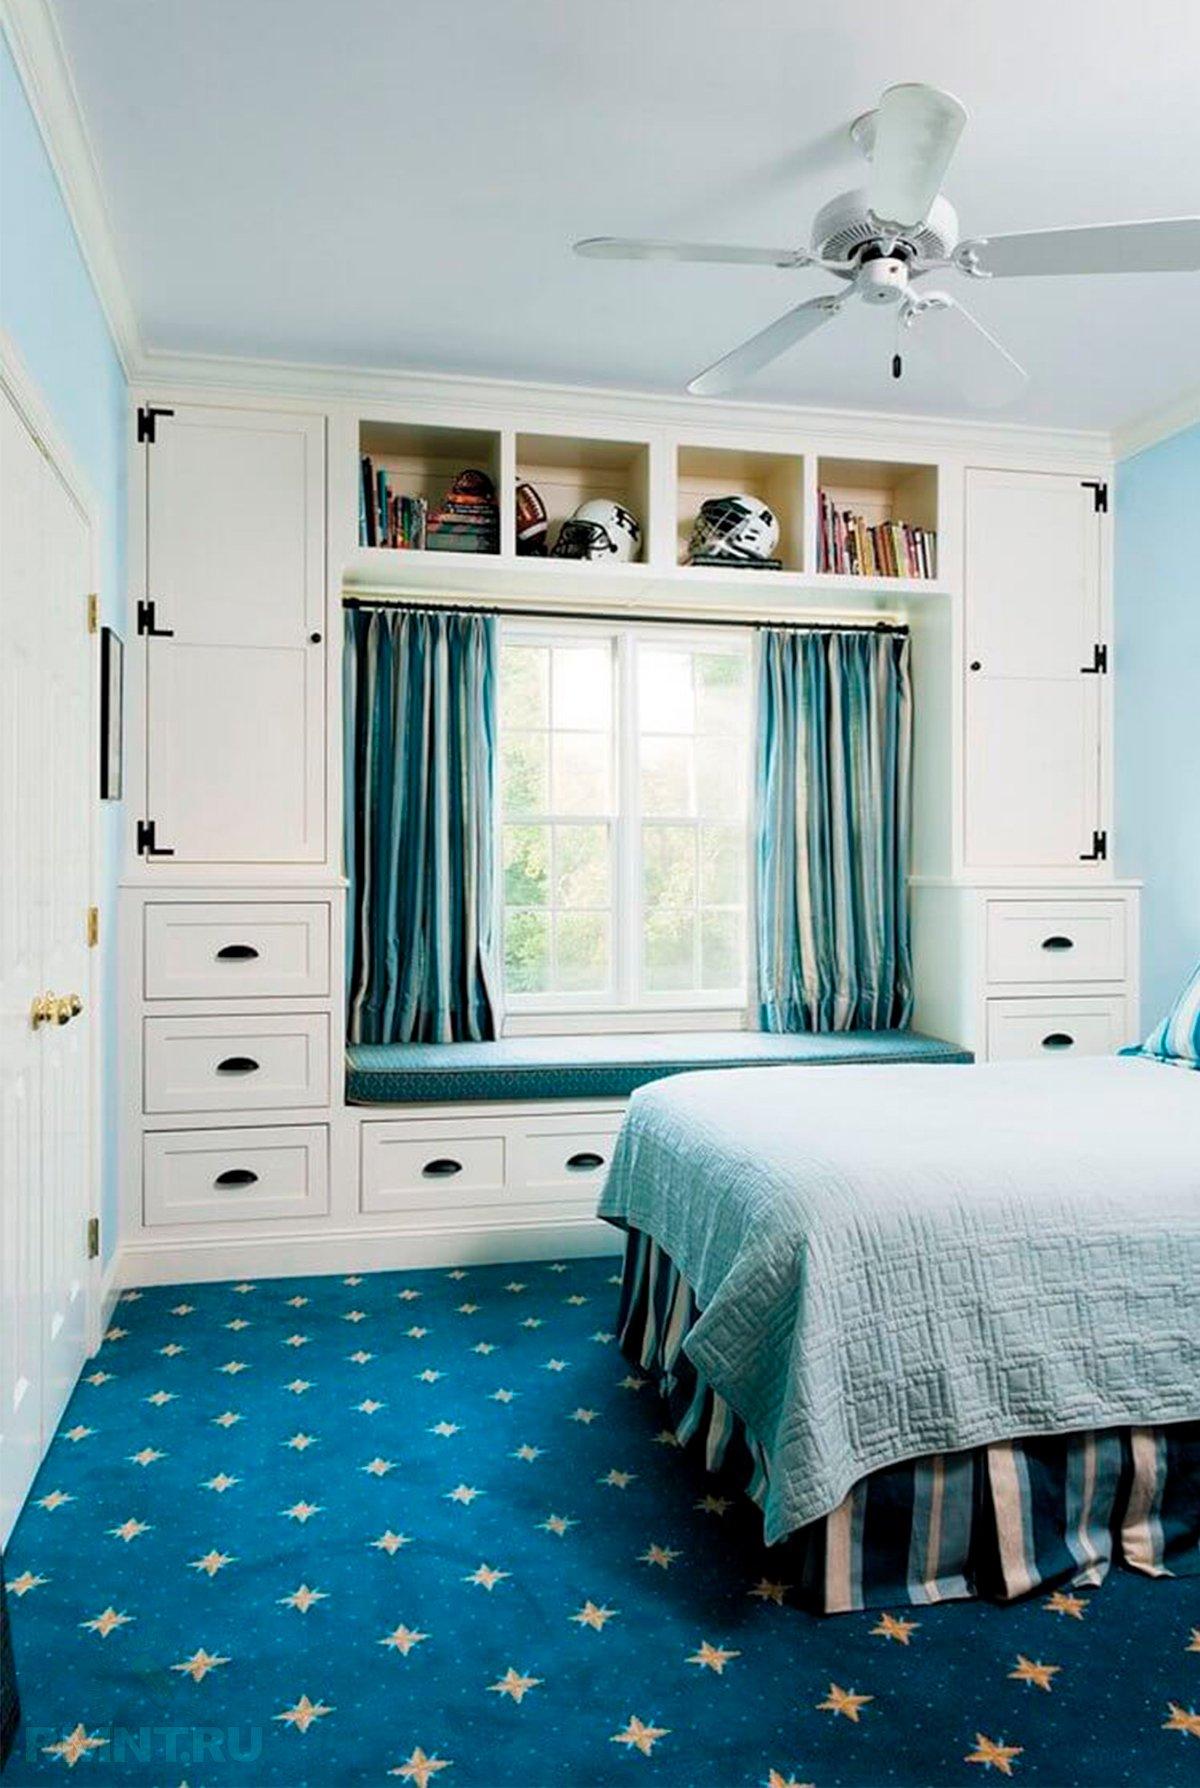 Шкаф вокруг окна: плюсы, минусы, фотопримеры